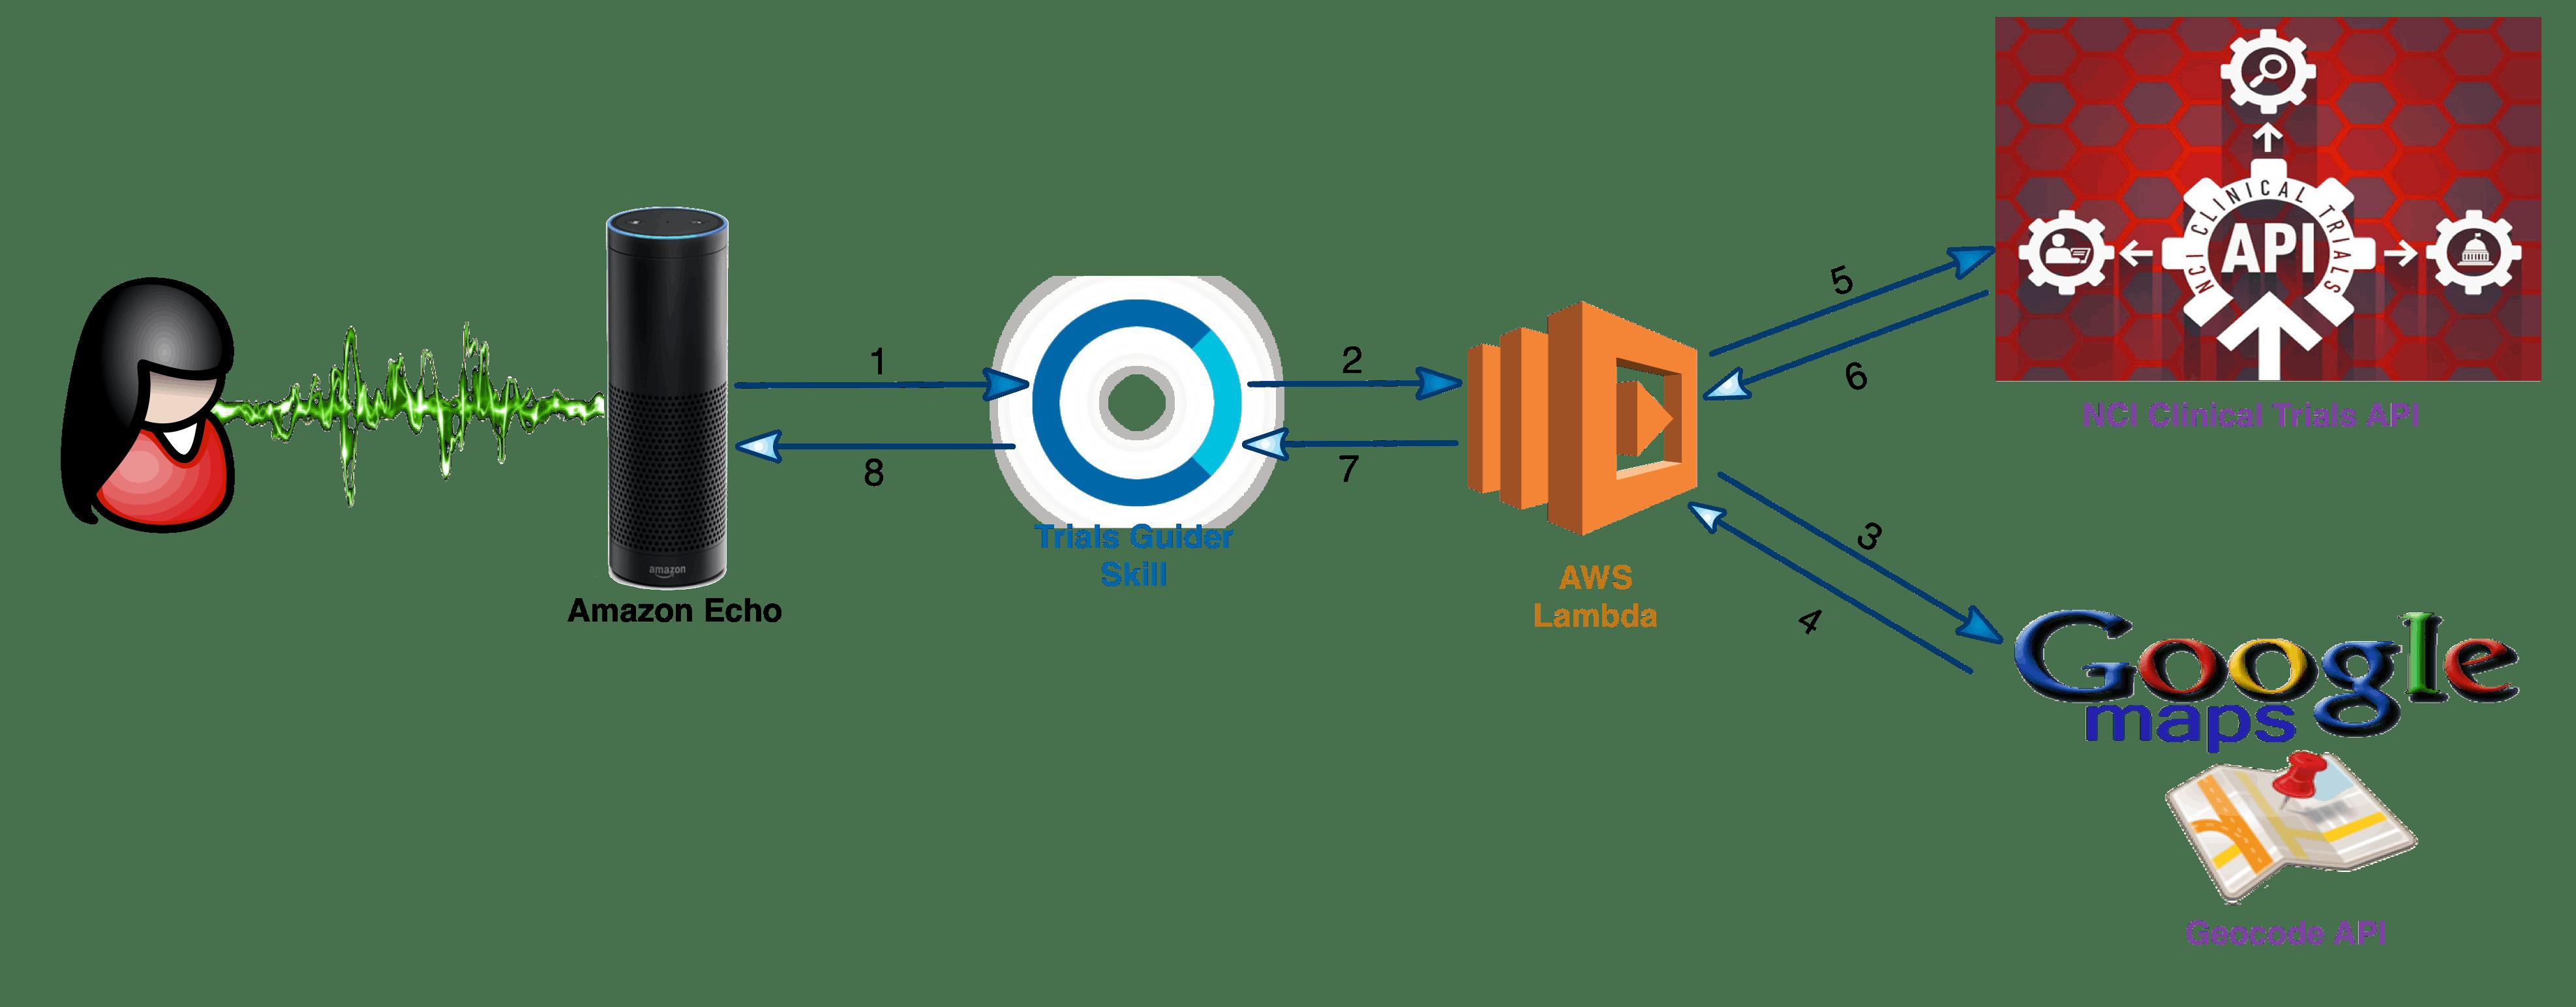 Trials Guider Architecture